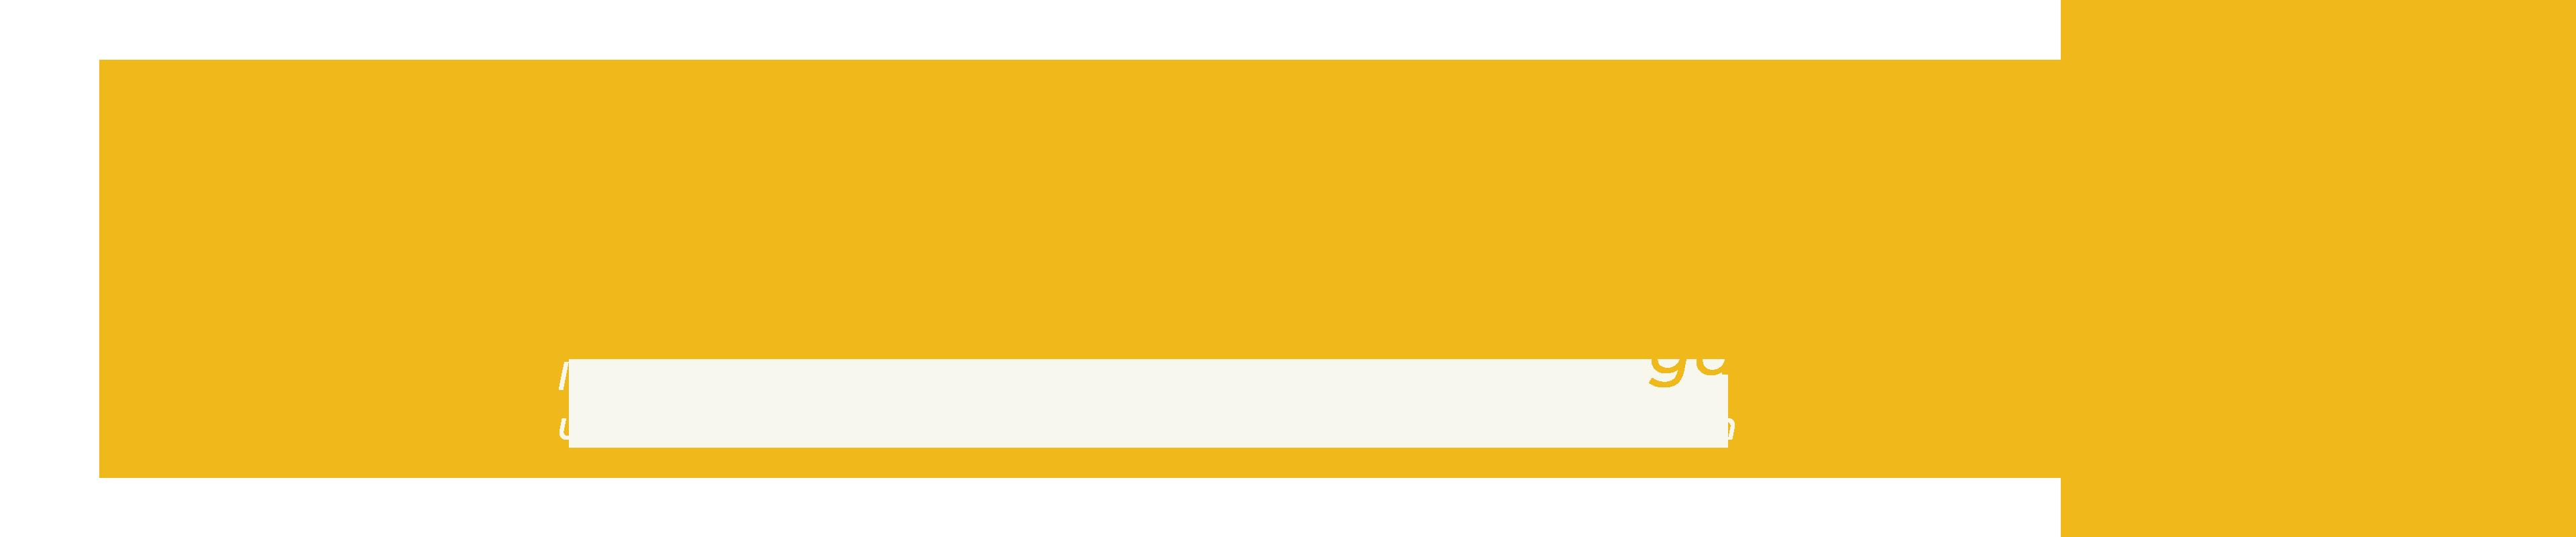 header_logo copy